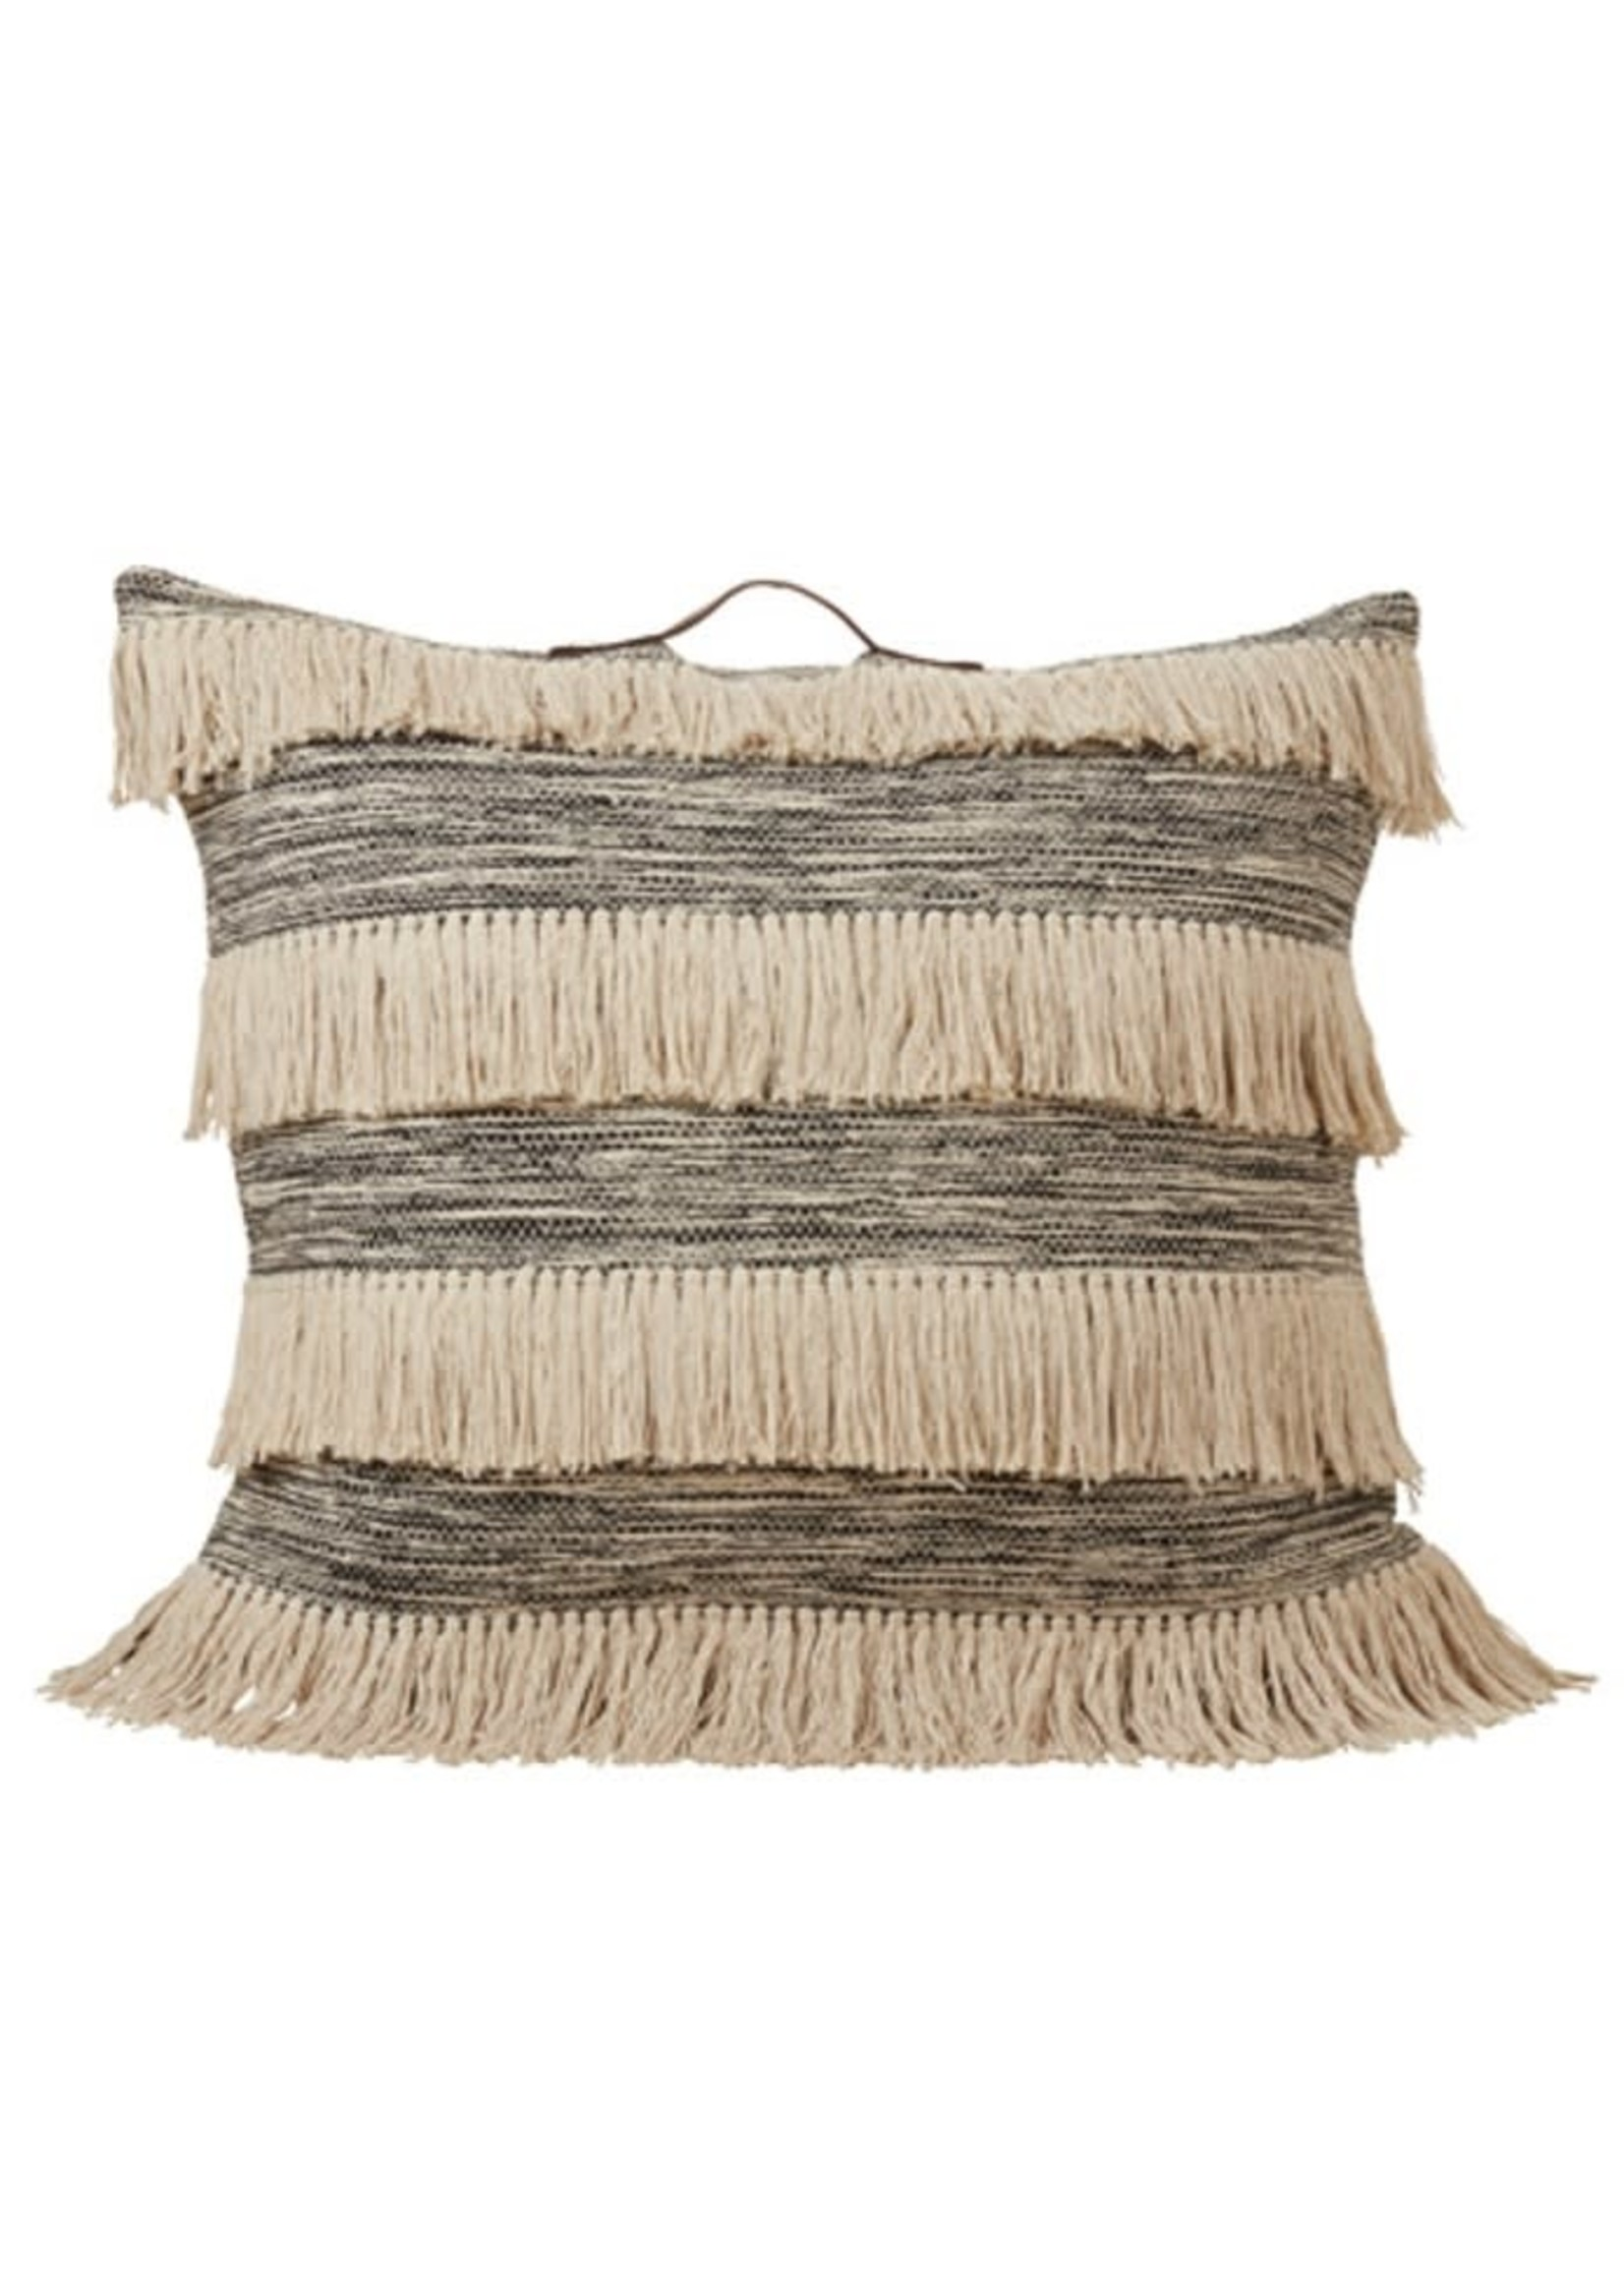 Saro SARO Tassel Floor Pillow Poly Filled - Black